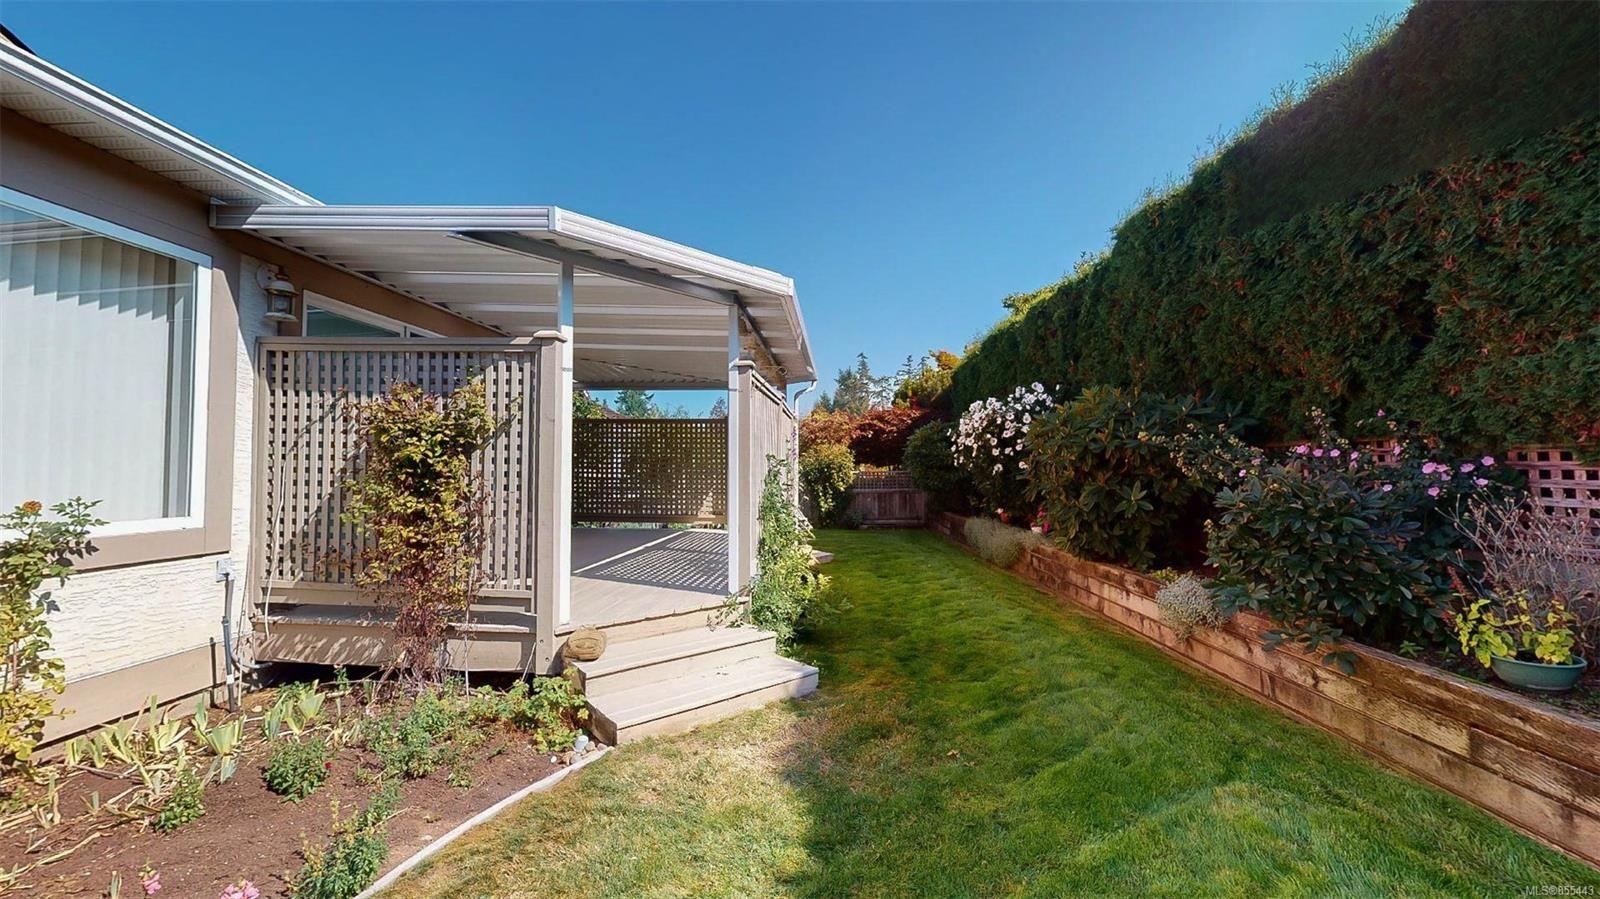 Photo 8: Photos: 1294 Leeward Way in : PQ Qualicum Beach House for sale (Parksville/Qualicum)  : MLS®# 855443